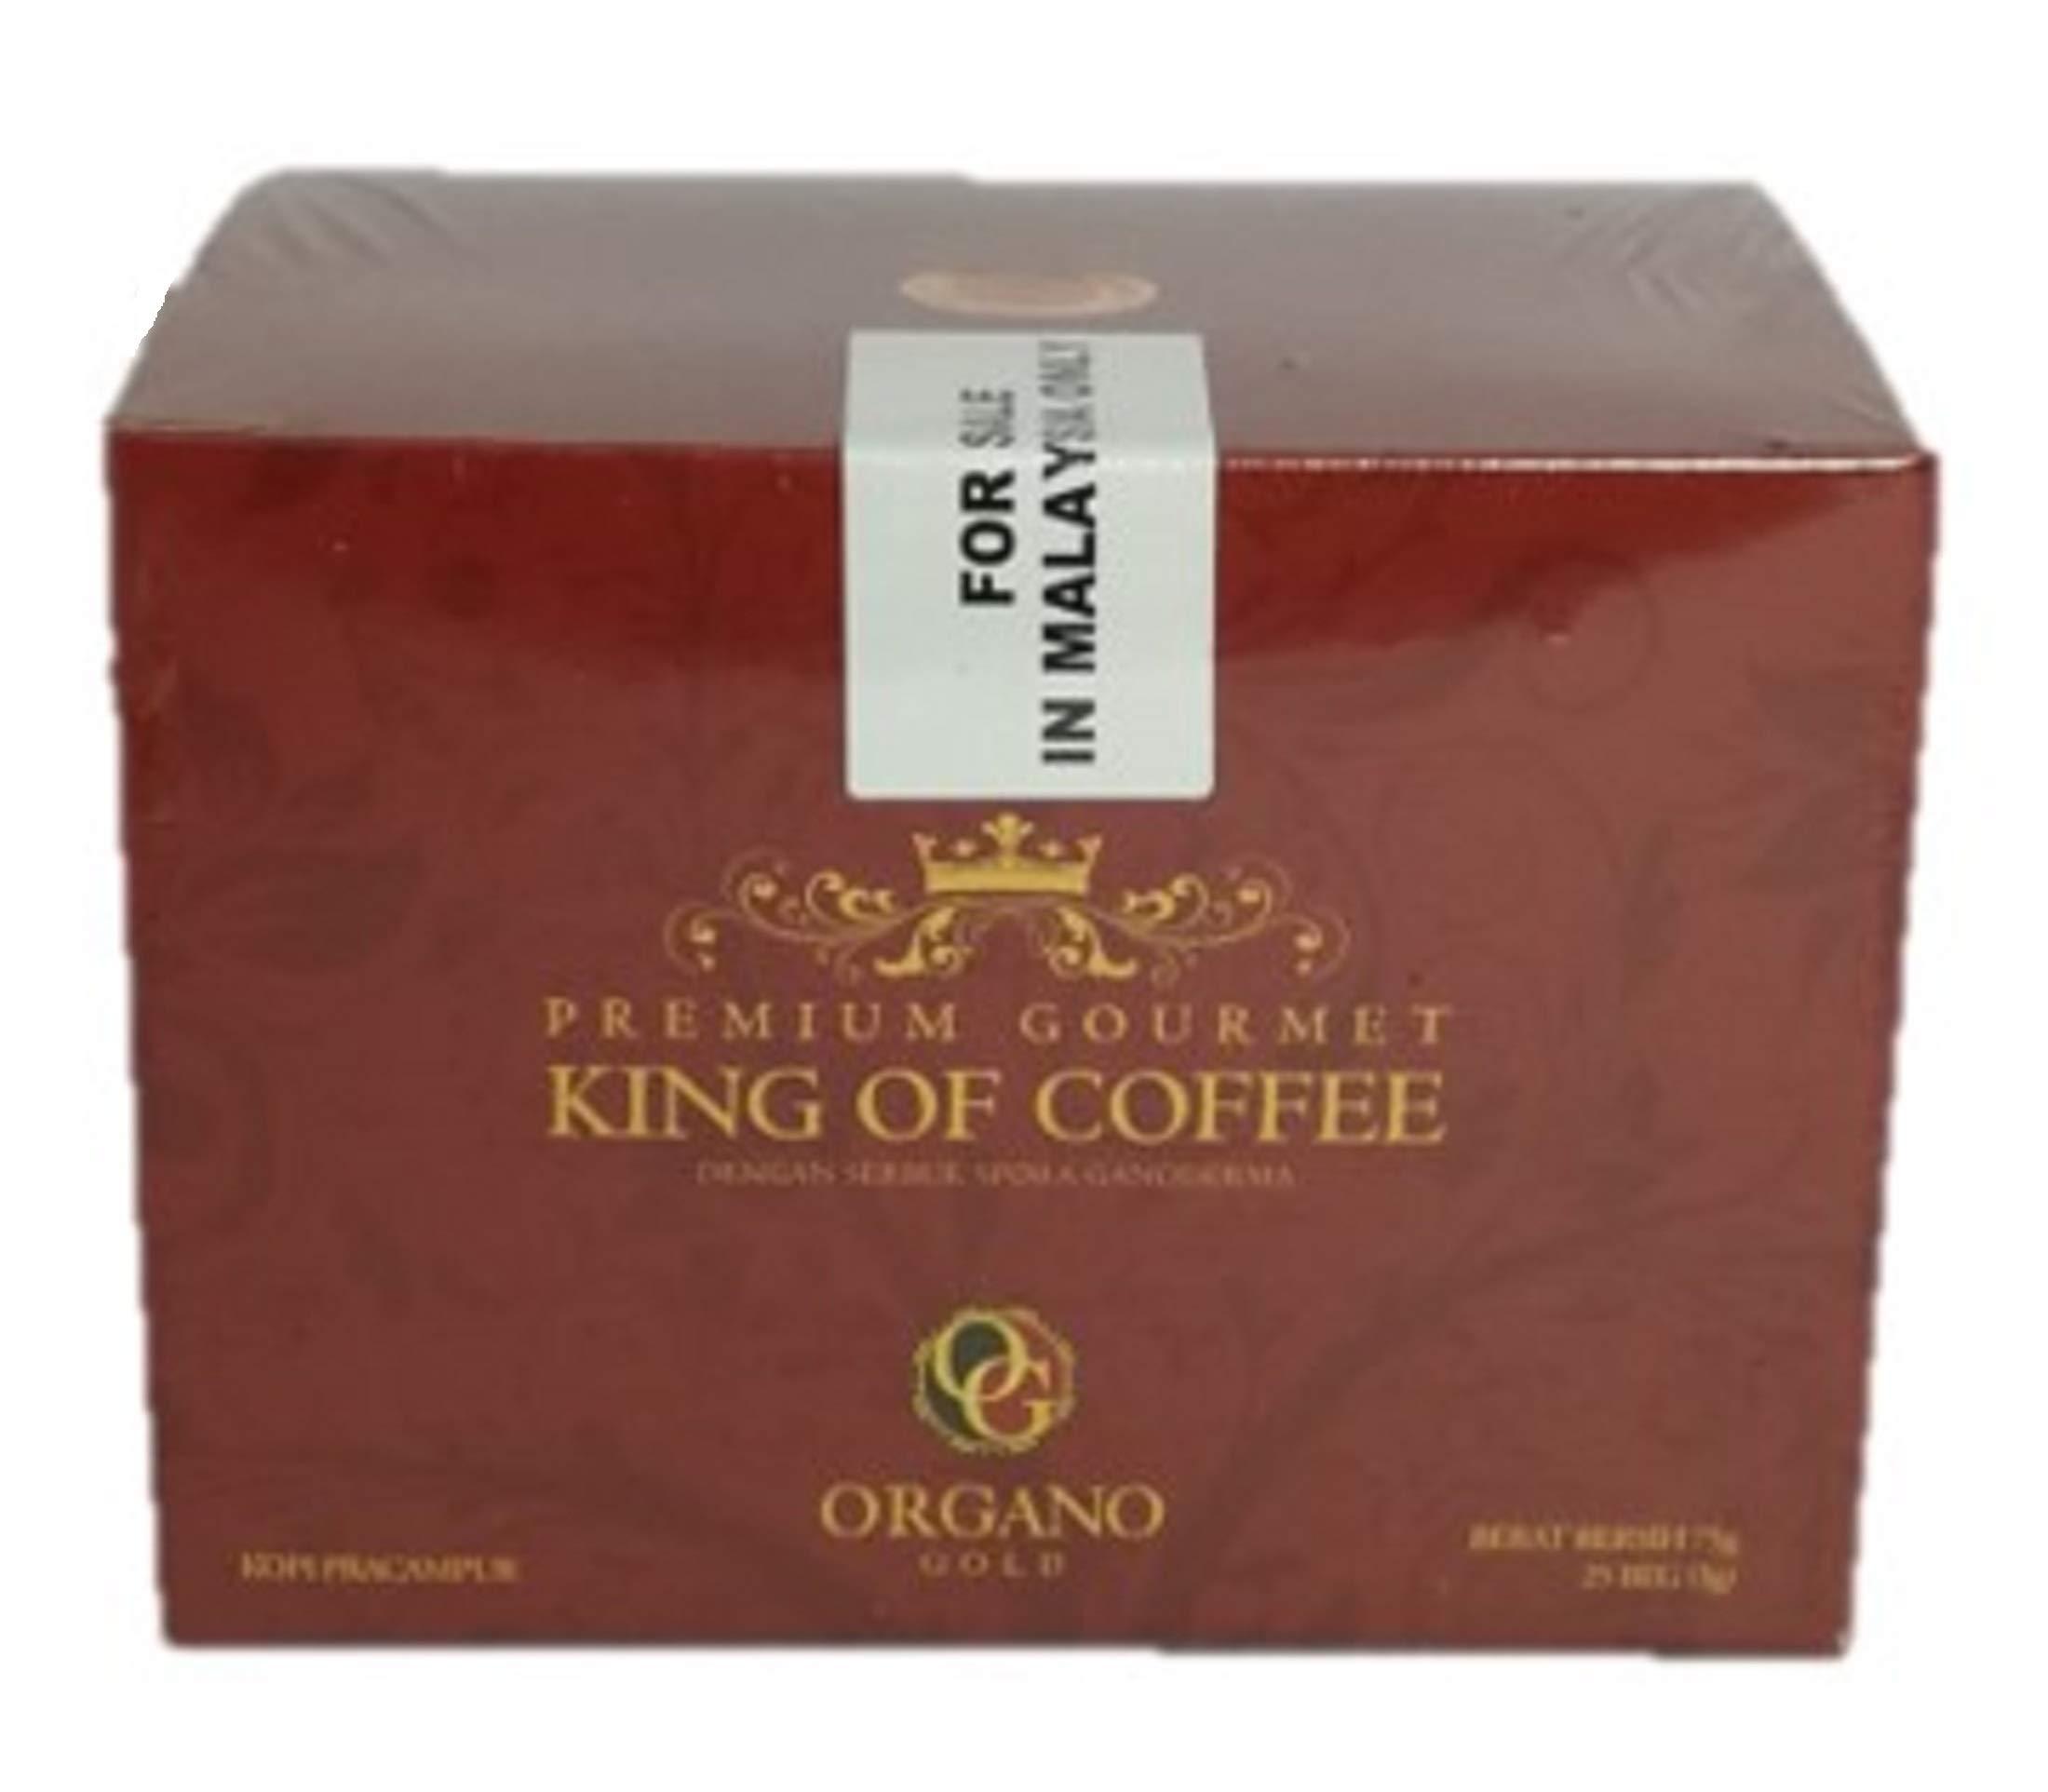 2 Boxes of Organo Gold Ganoderma Gourmet - Gourmet King Coffee (25 sachets)